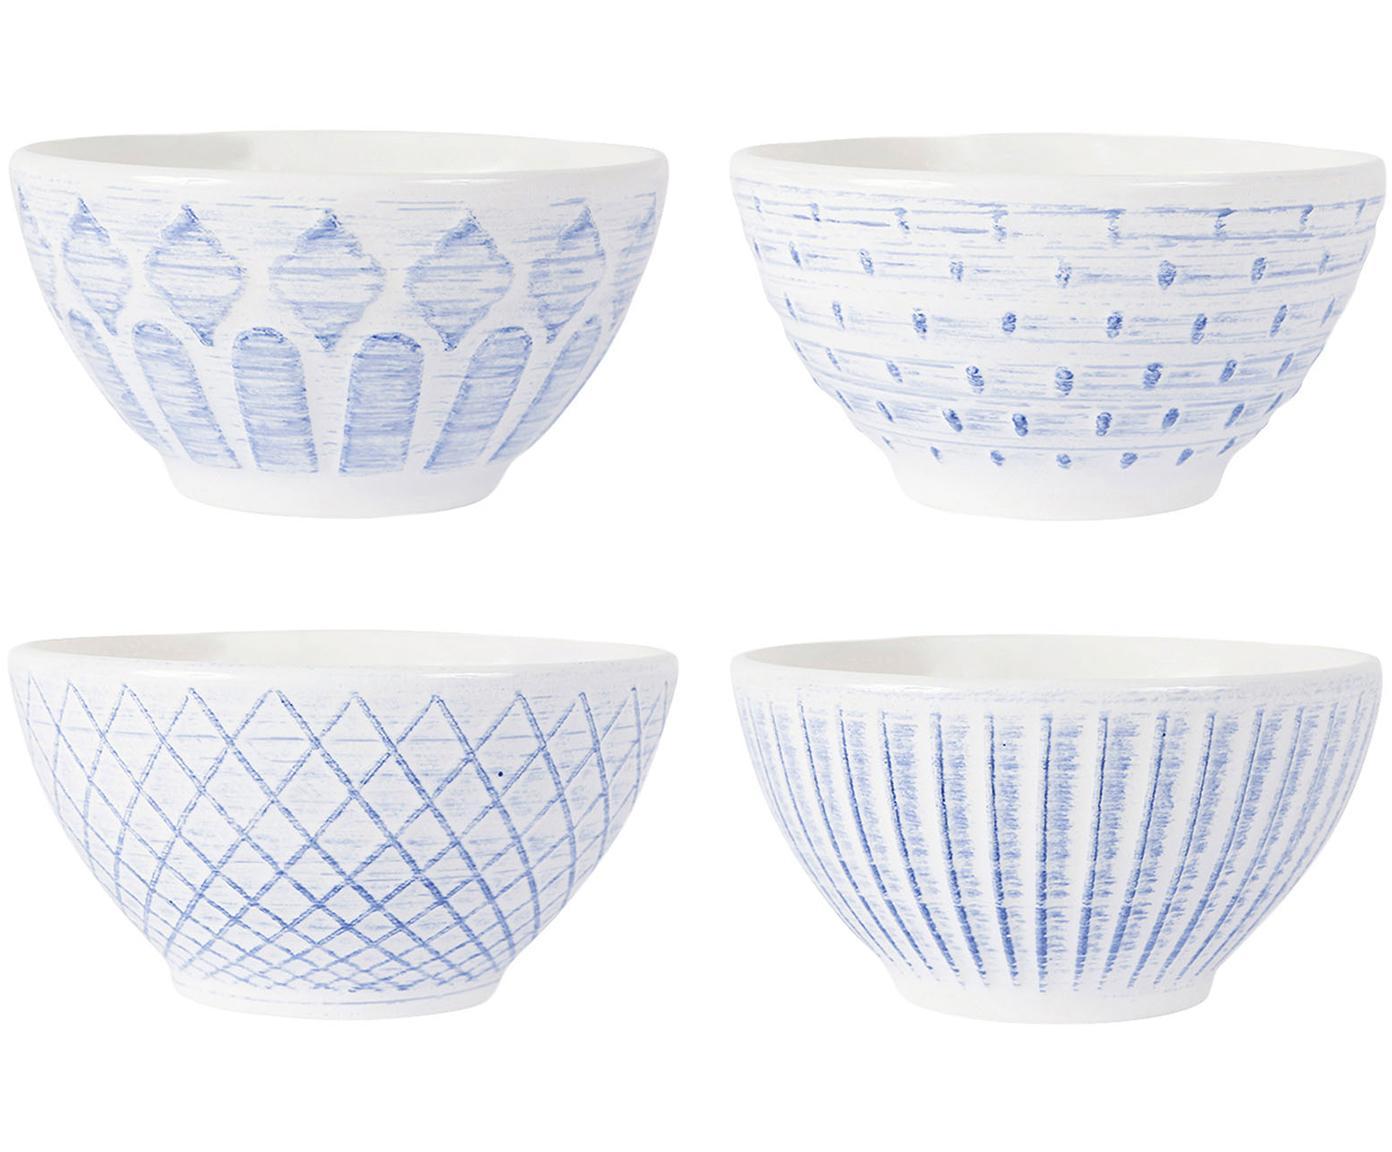 Cuencos Tartine, 4uds., Gres, Azul, blanco, Ø 20 x Al 17 cm